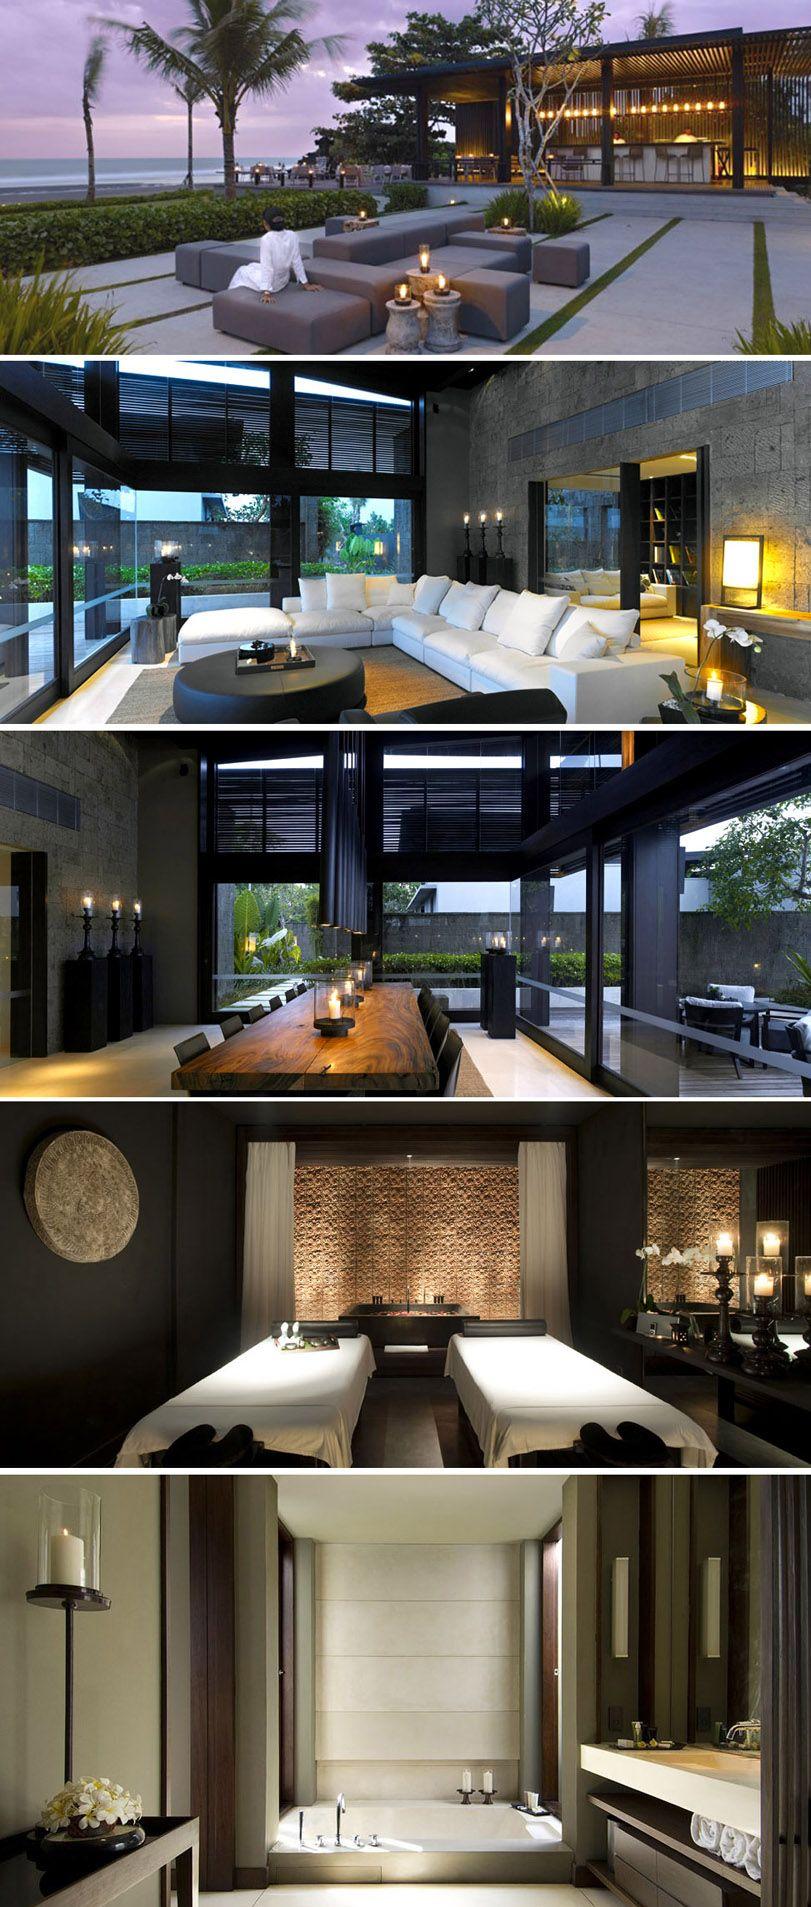 Rooms: Amazing Bali Hotel In Peaceful Surroundings! -Alila Villas